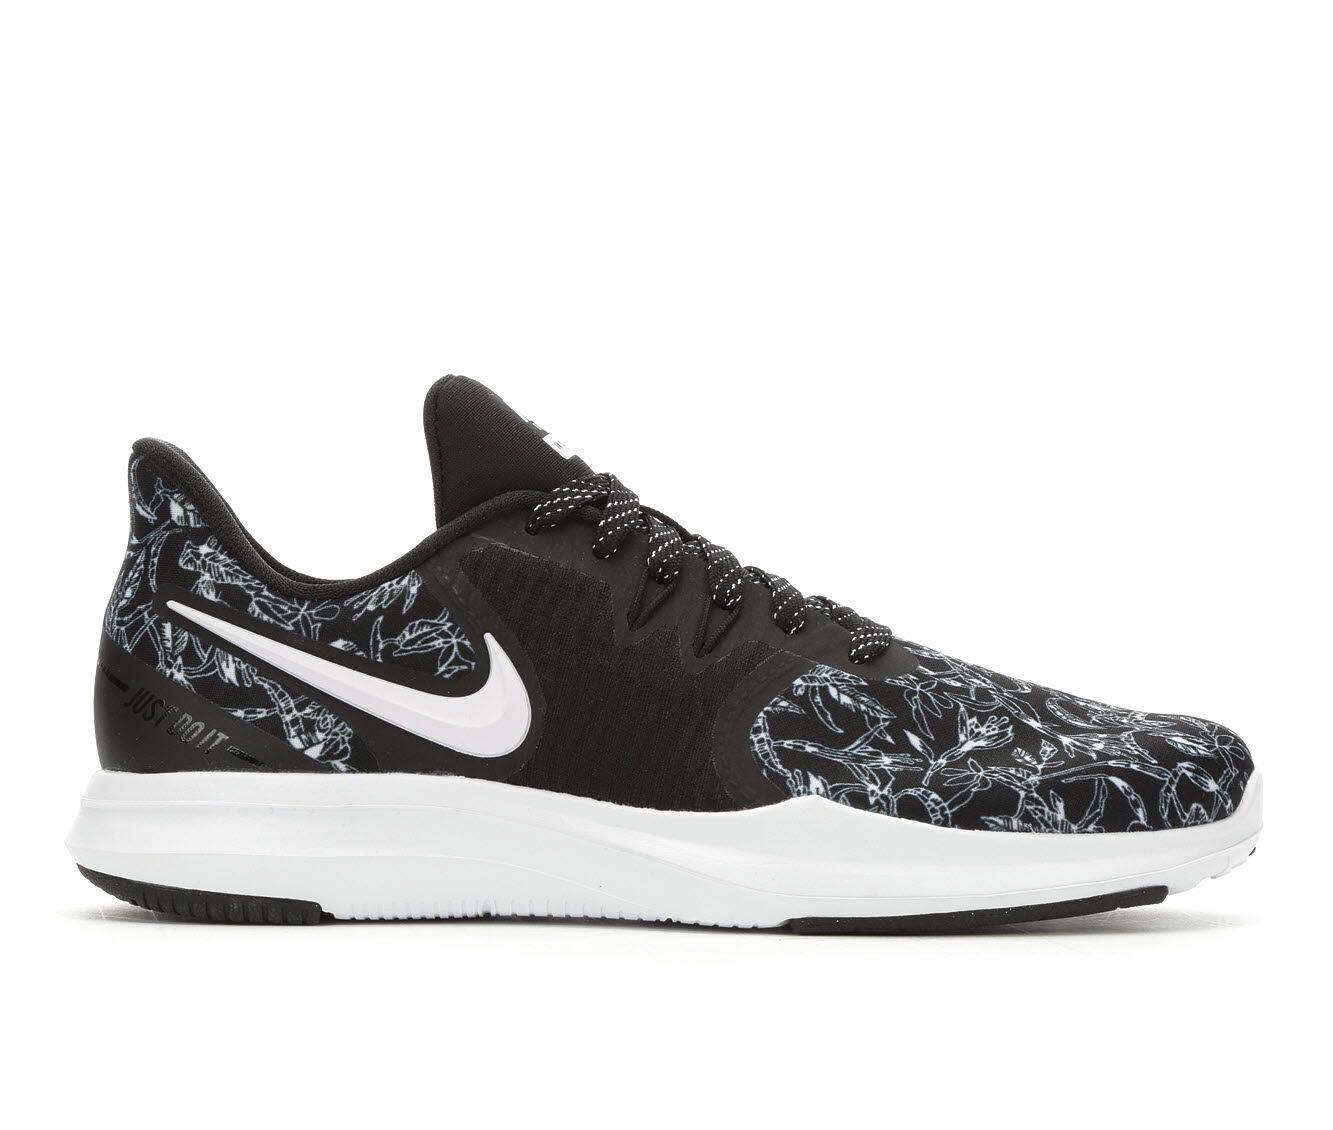 Women's Nike In-Season Tr 8 Premium Training Shoes Black/Wht Print